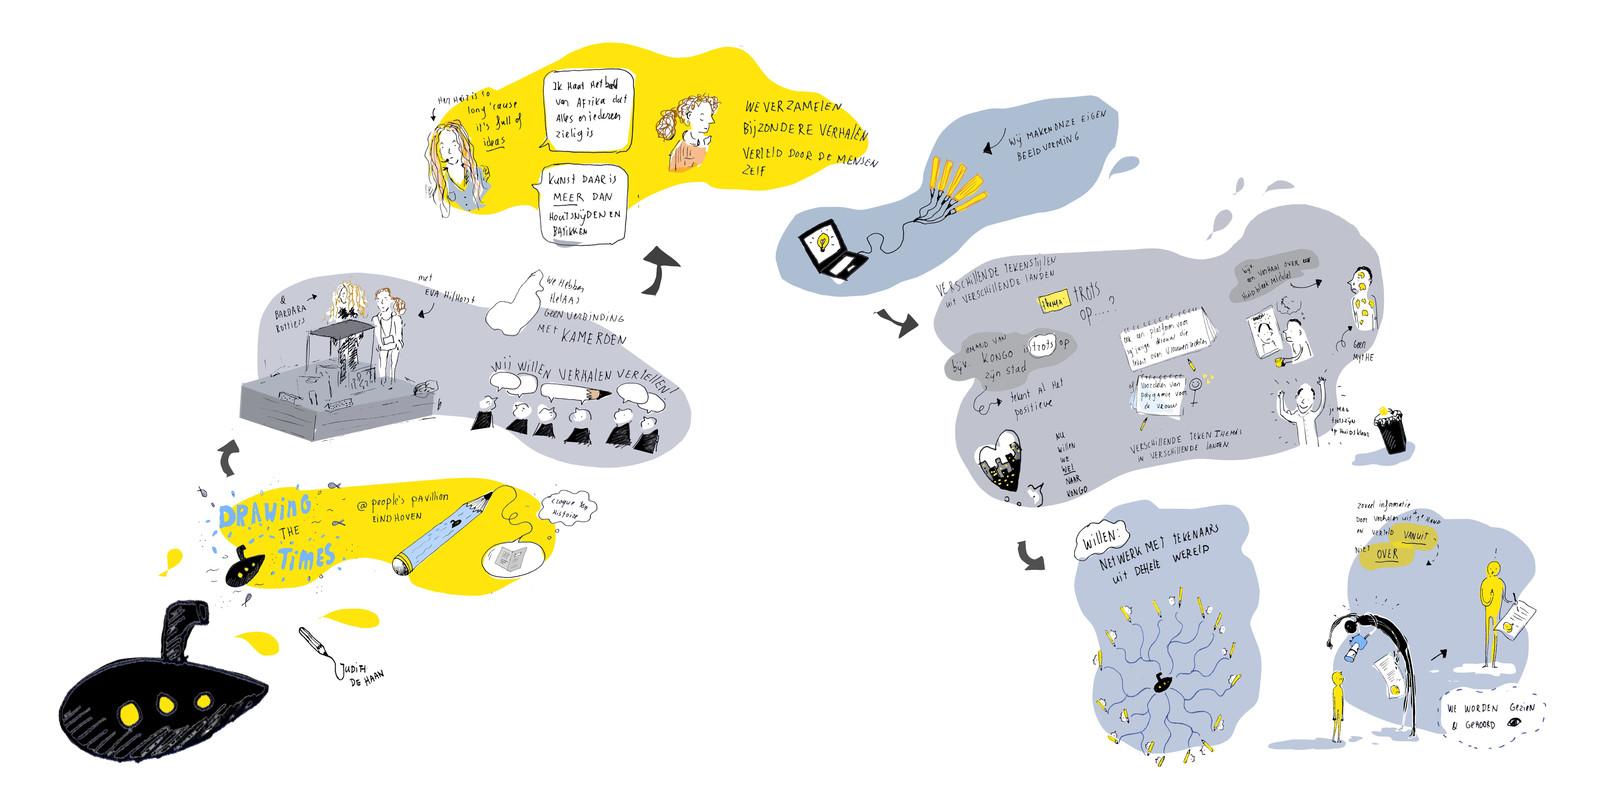 Getekend verslag van de lezing van Eva Hilhorst, Barbara Rottiers & Drawing the Times in het people's pavillion.